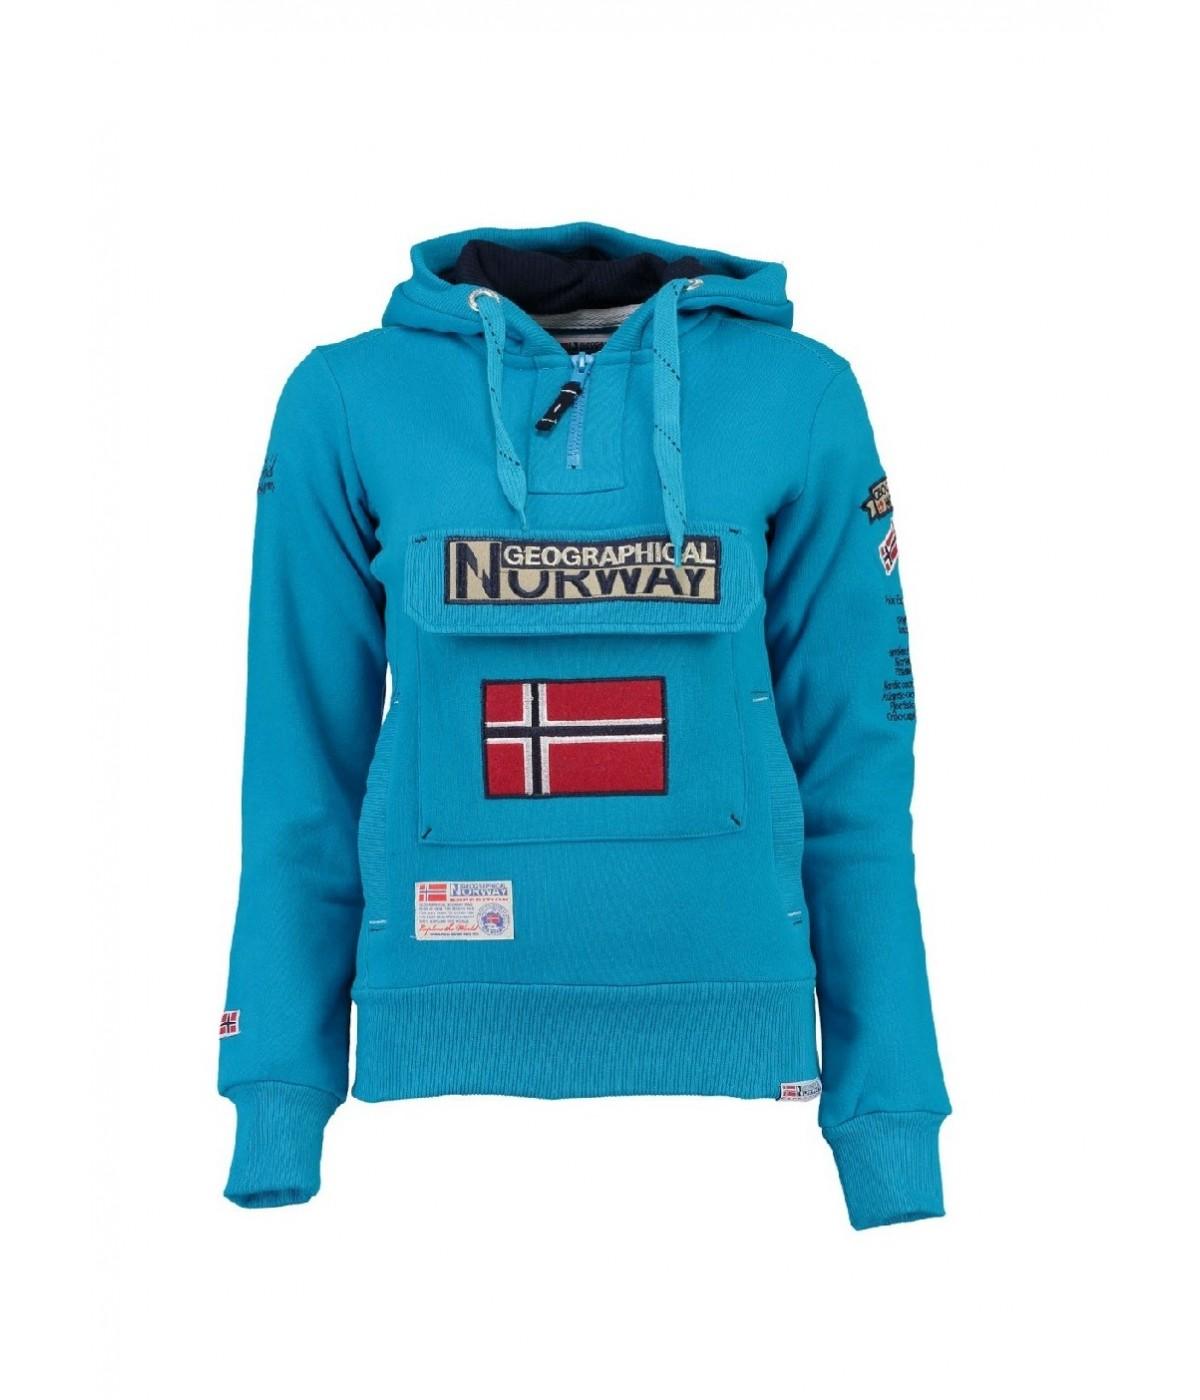 Sweat à capuche Femme Geographical Norway Gymclass Bleu Ciel